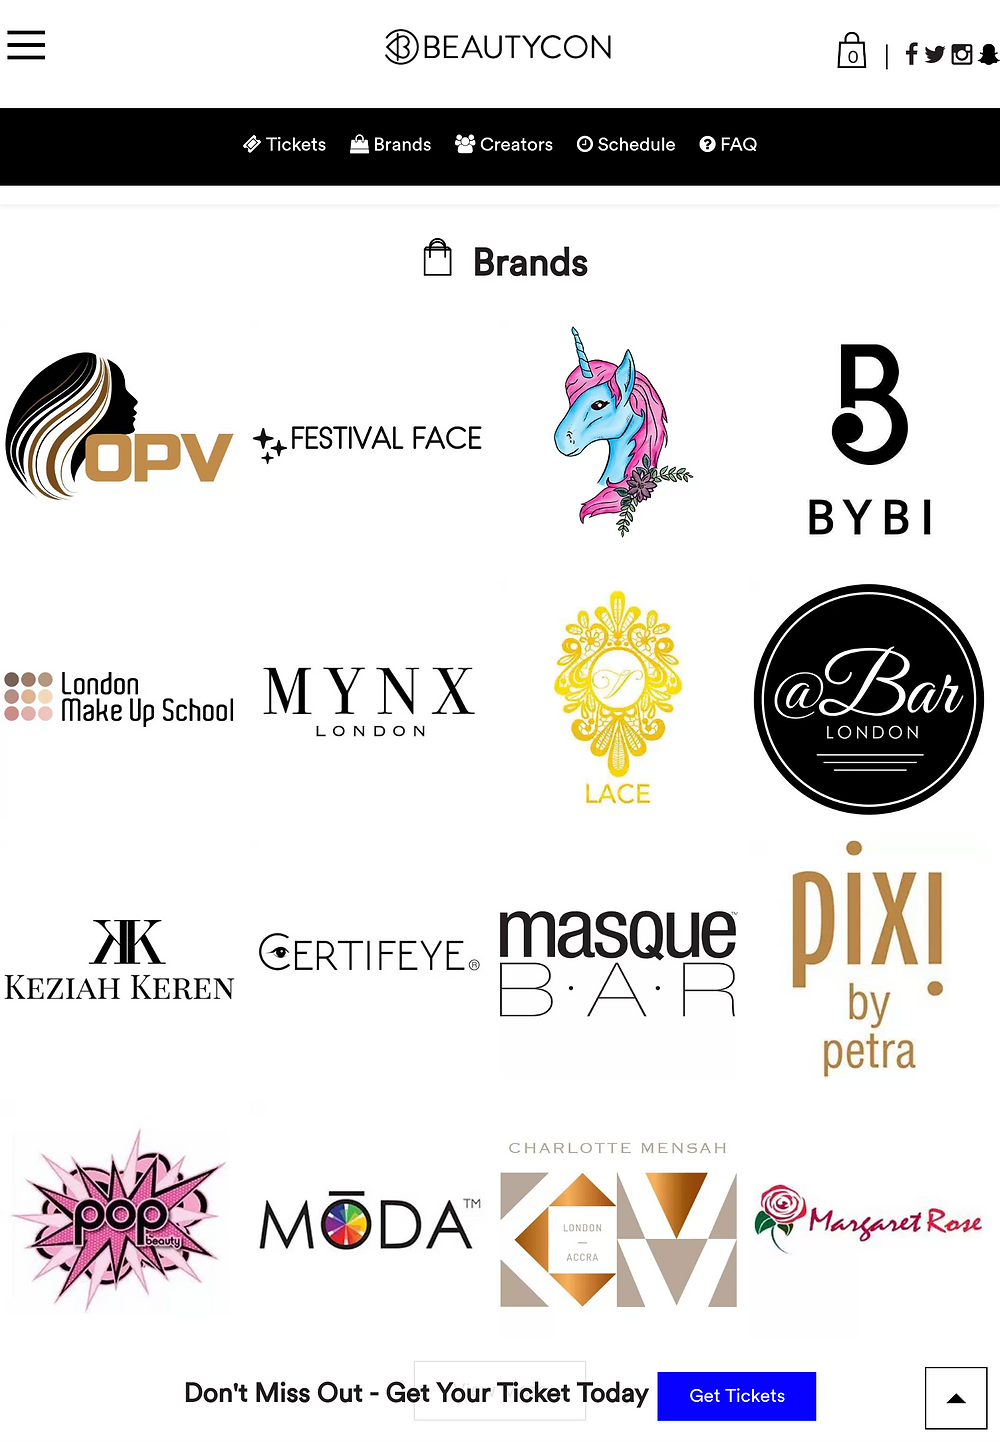 Brands at BeautyCon London inc @Bar London , MYNX London, VLace Cosmetics, Keziah Keren, Margaret Rose